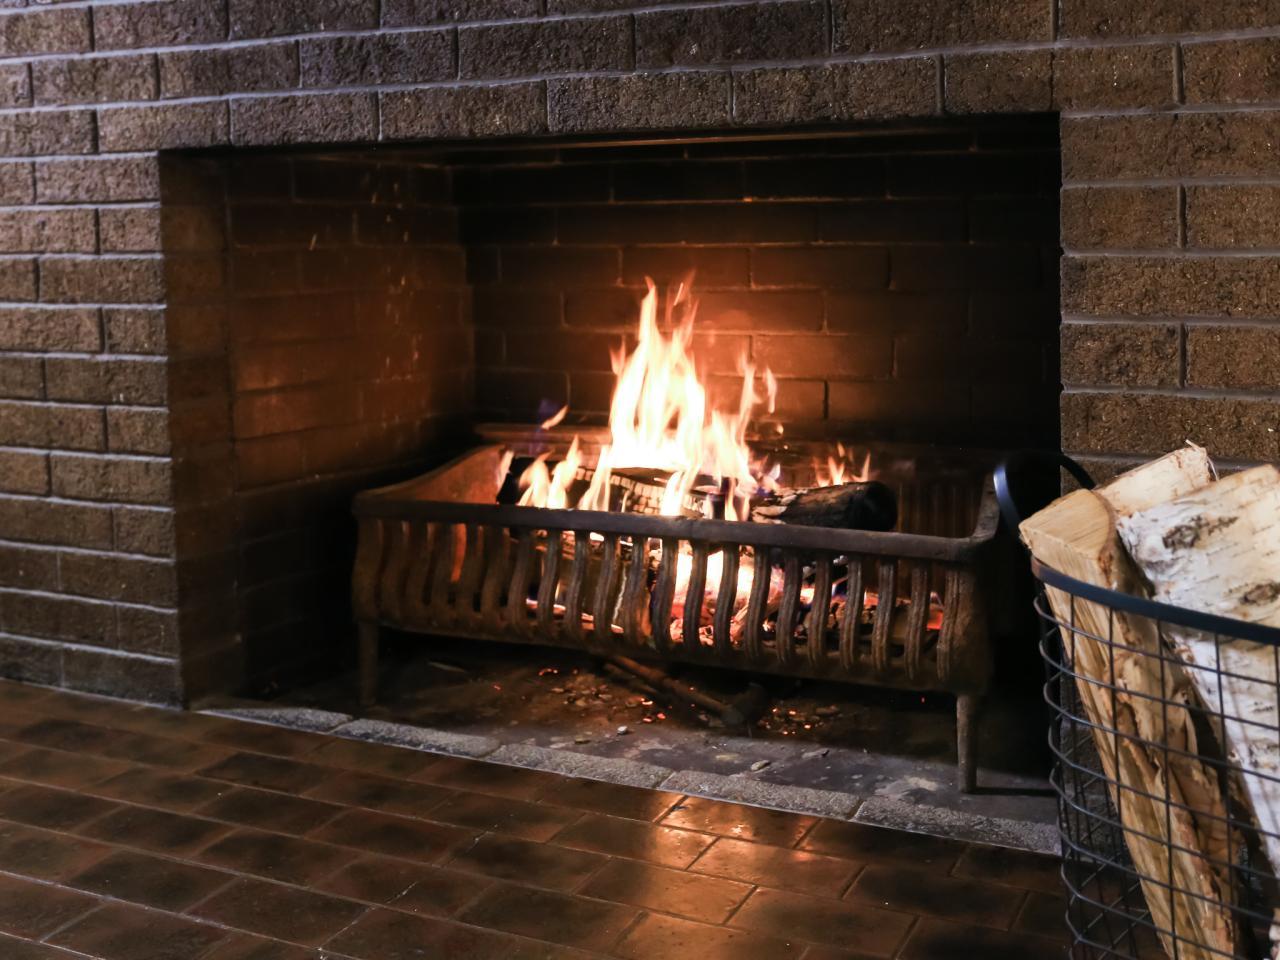 Bp dhra605 detail fireplace jpg rend hgtvcom 1280 960 jpeg